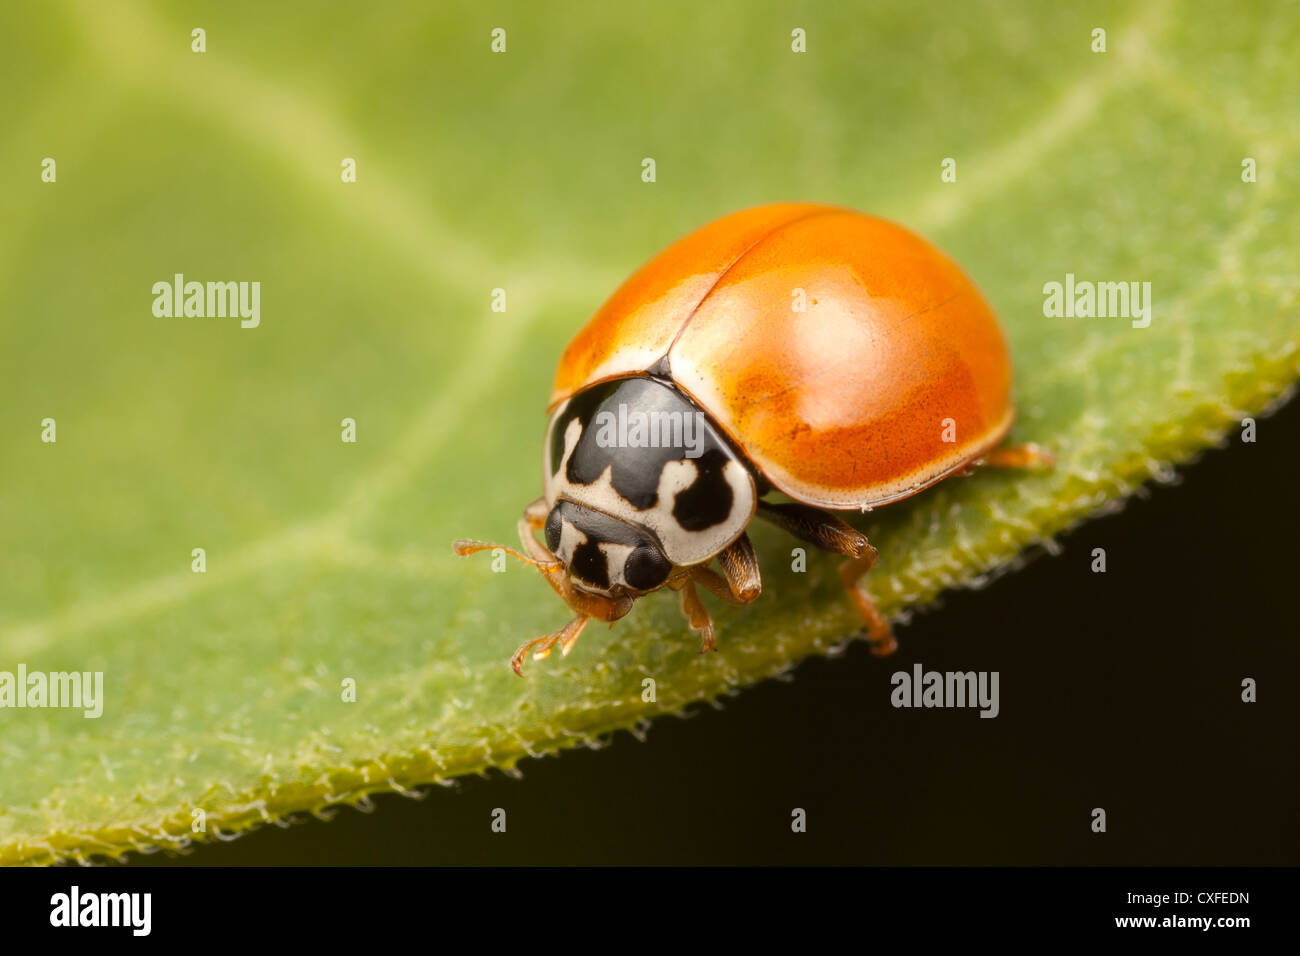 A Polished Lady Beetle (Cycloneda munda) perches on a leaf. Stock Photo